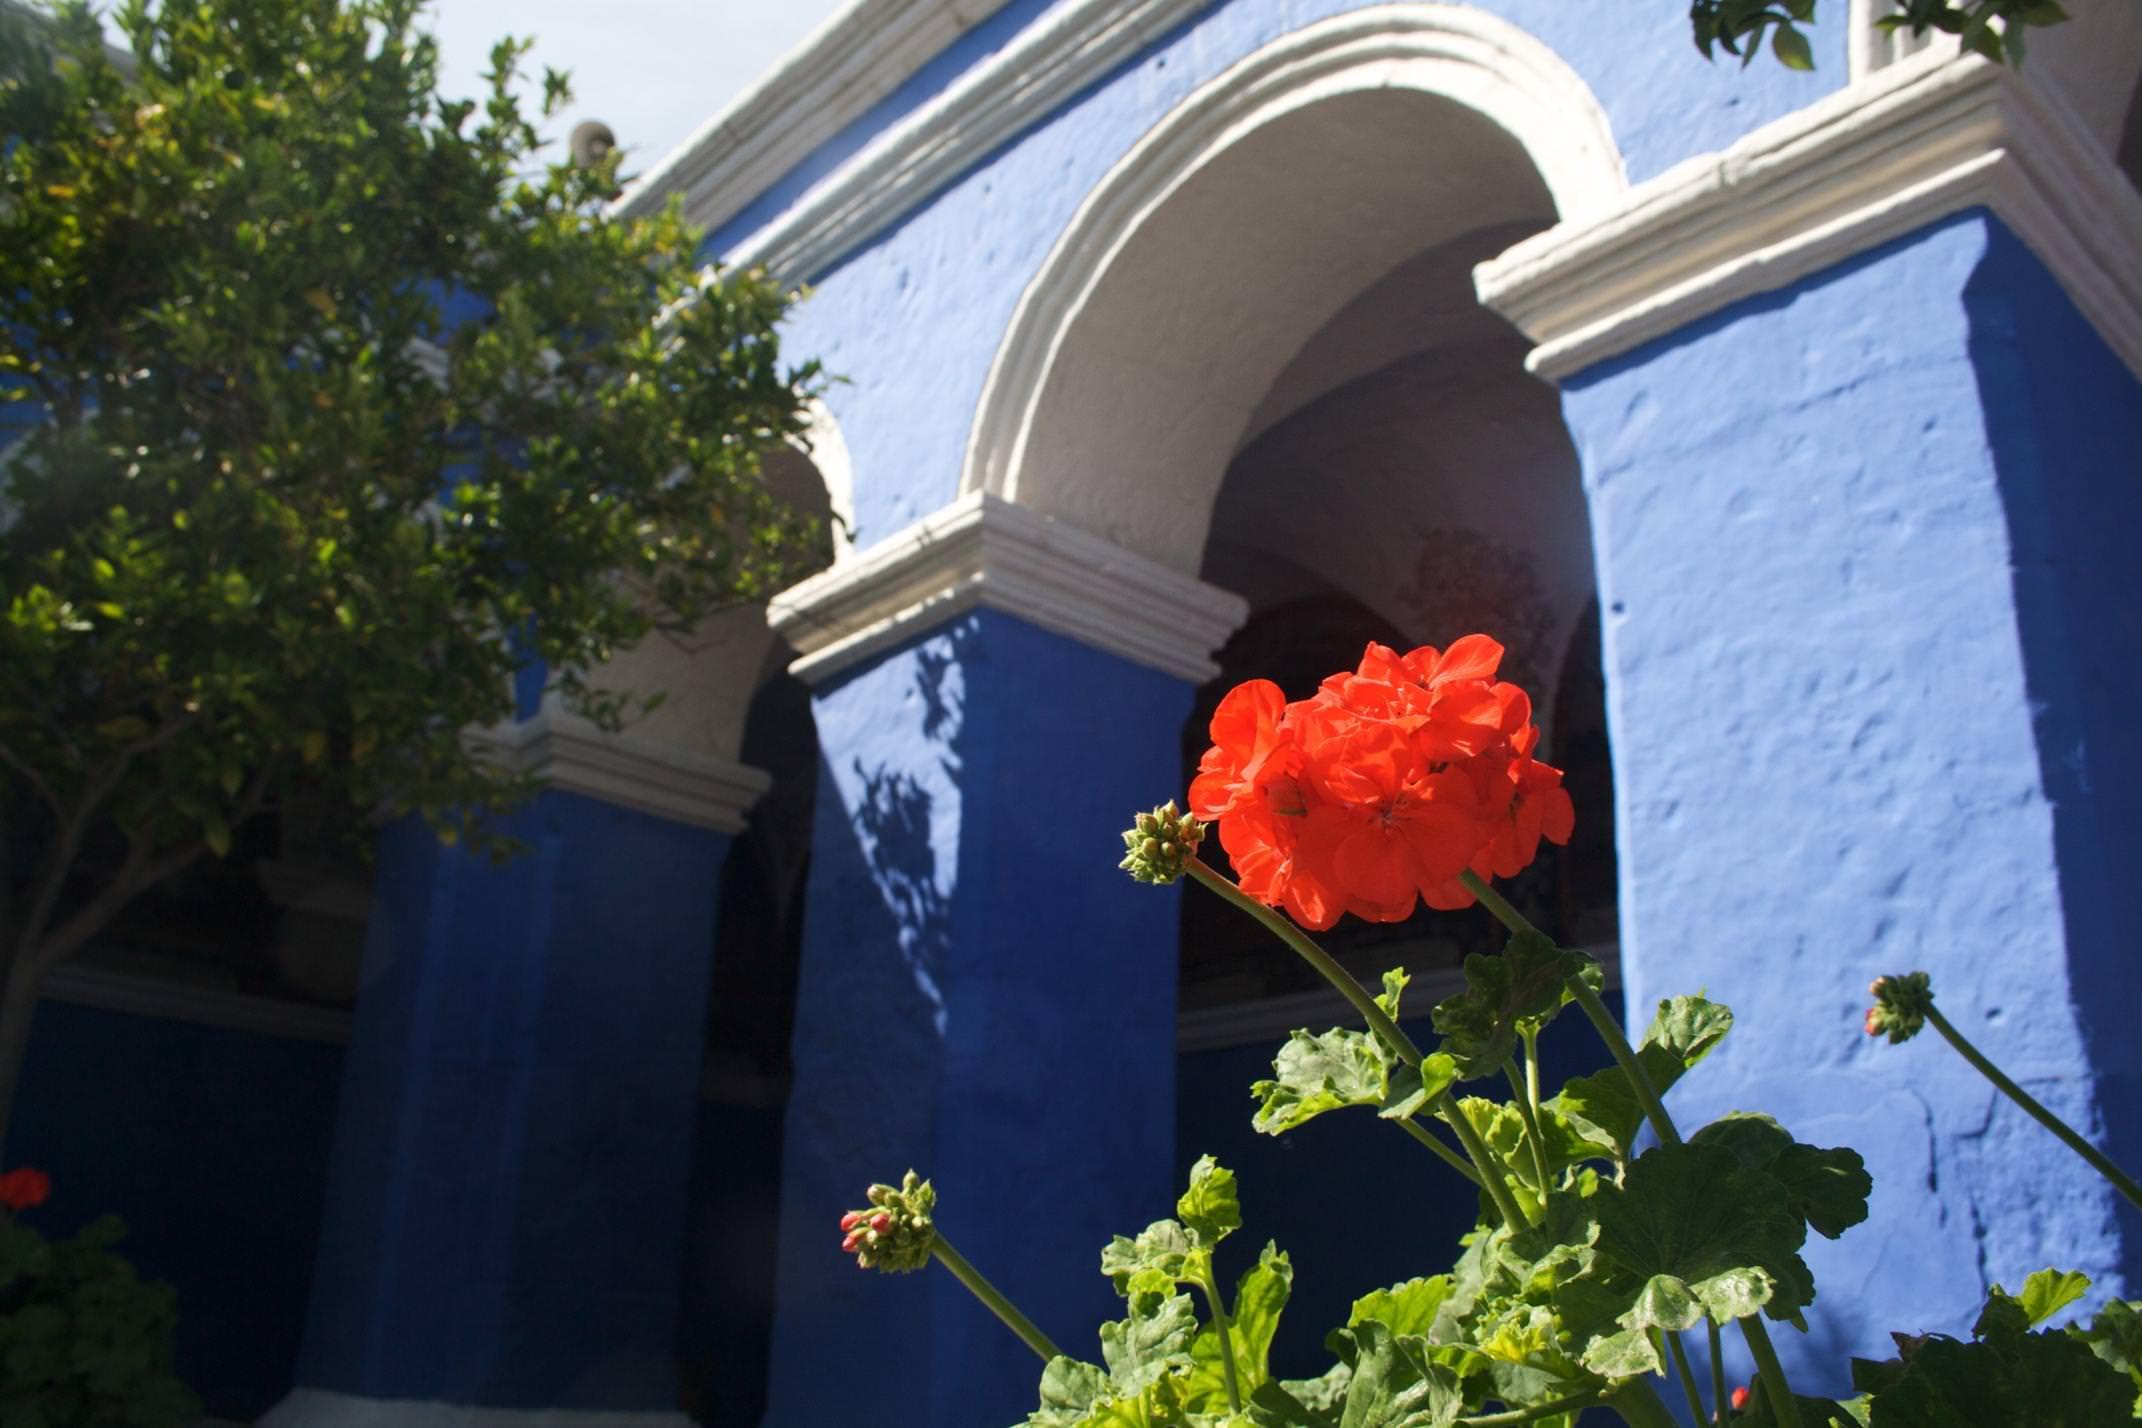 Peru arequipa geranium against blue wall of santa catalina convent